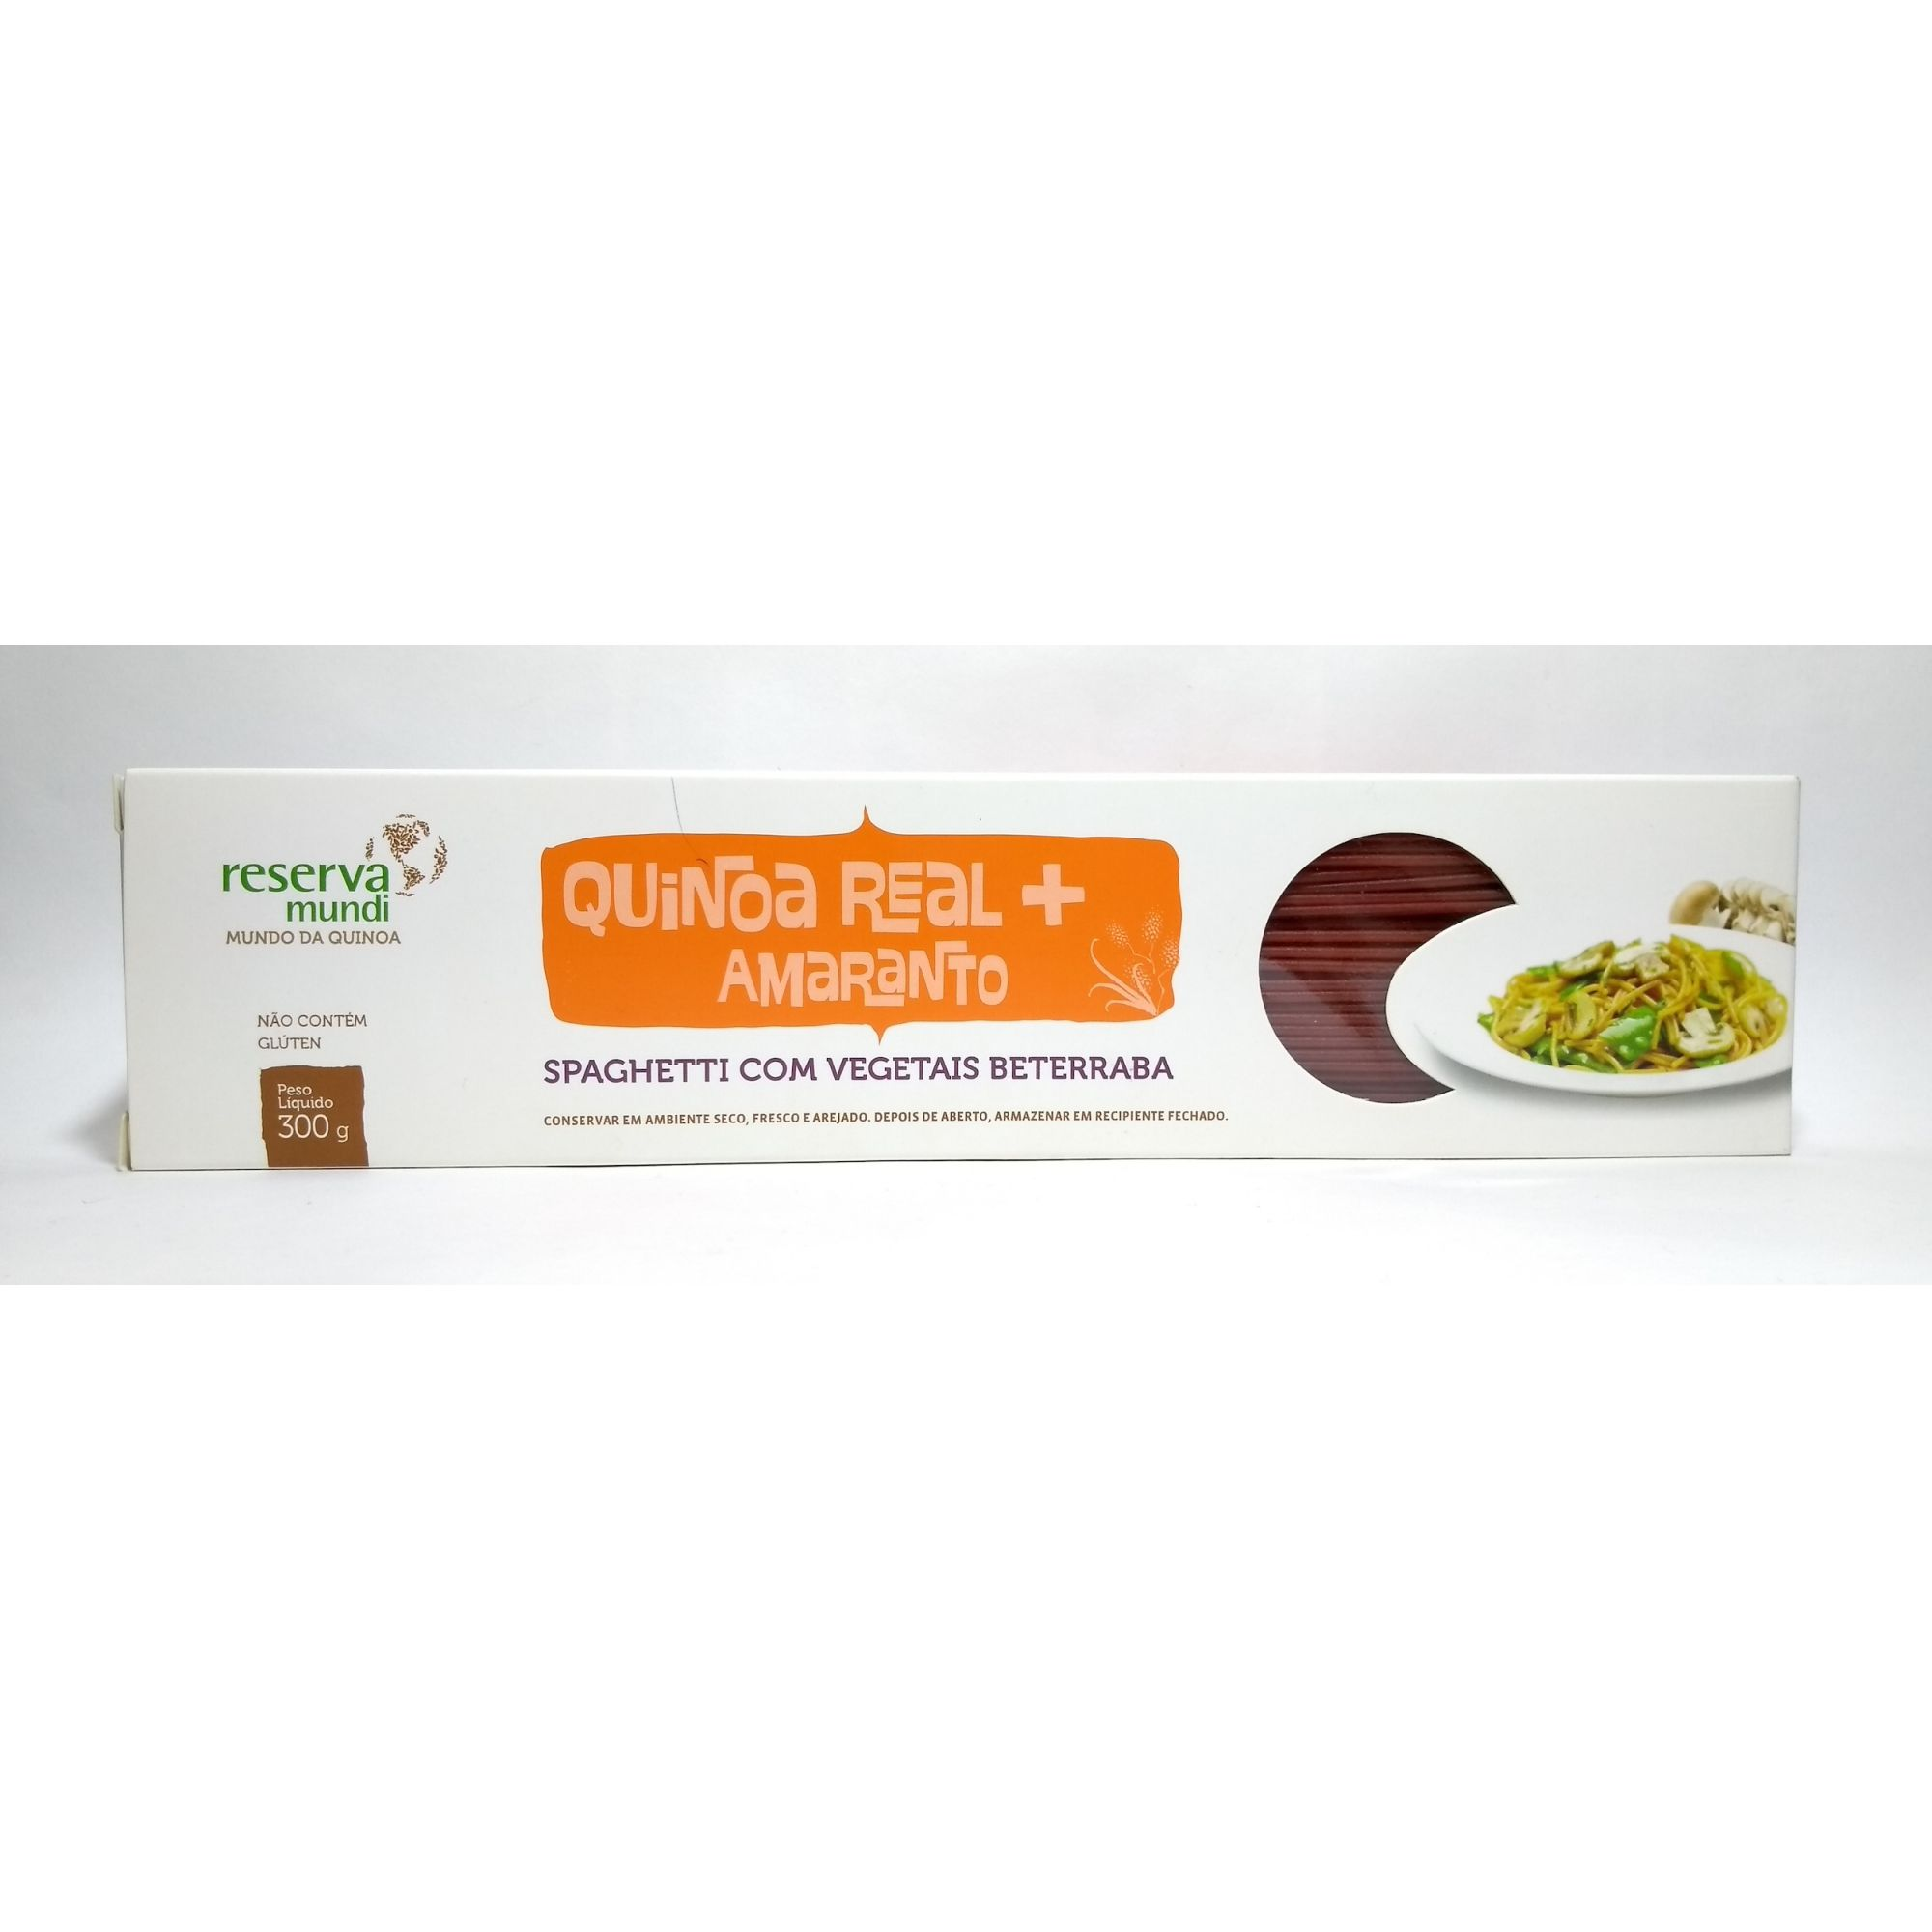 Spaghetti quinoa real e amaranto, 300g – Reserva Mundi